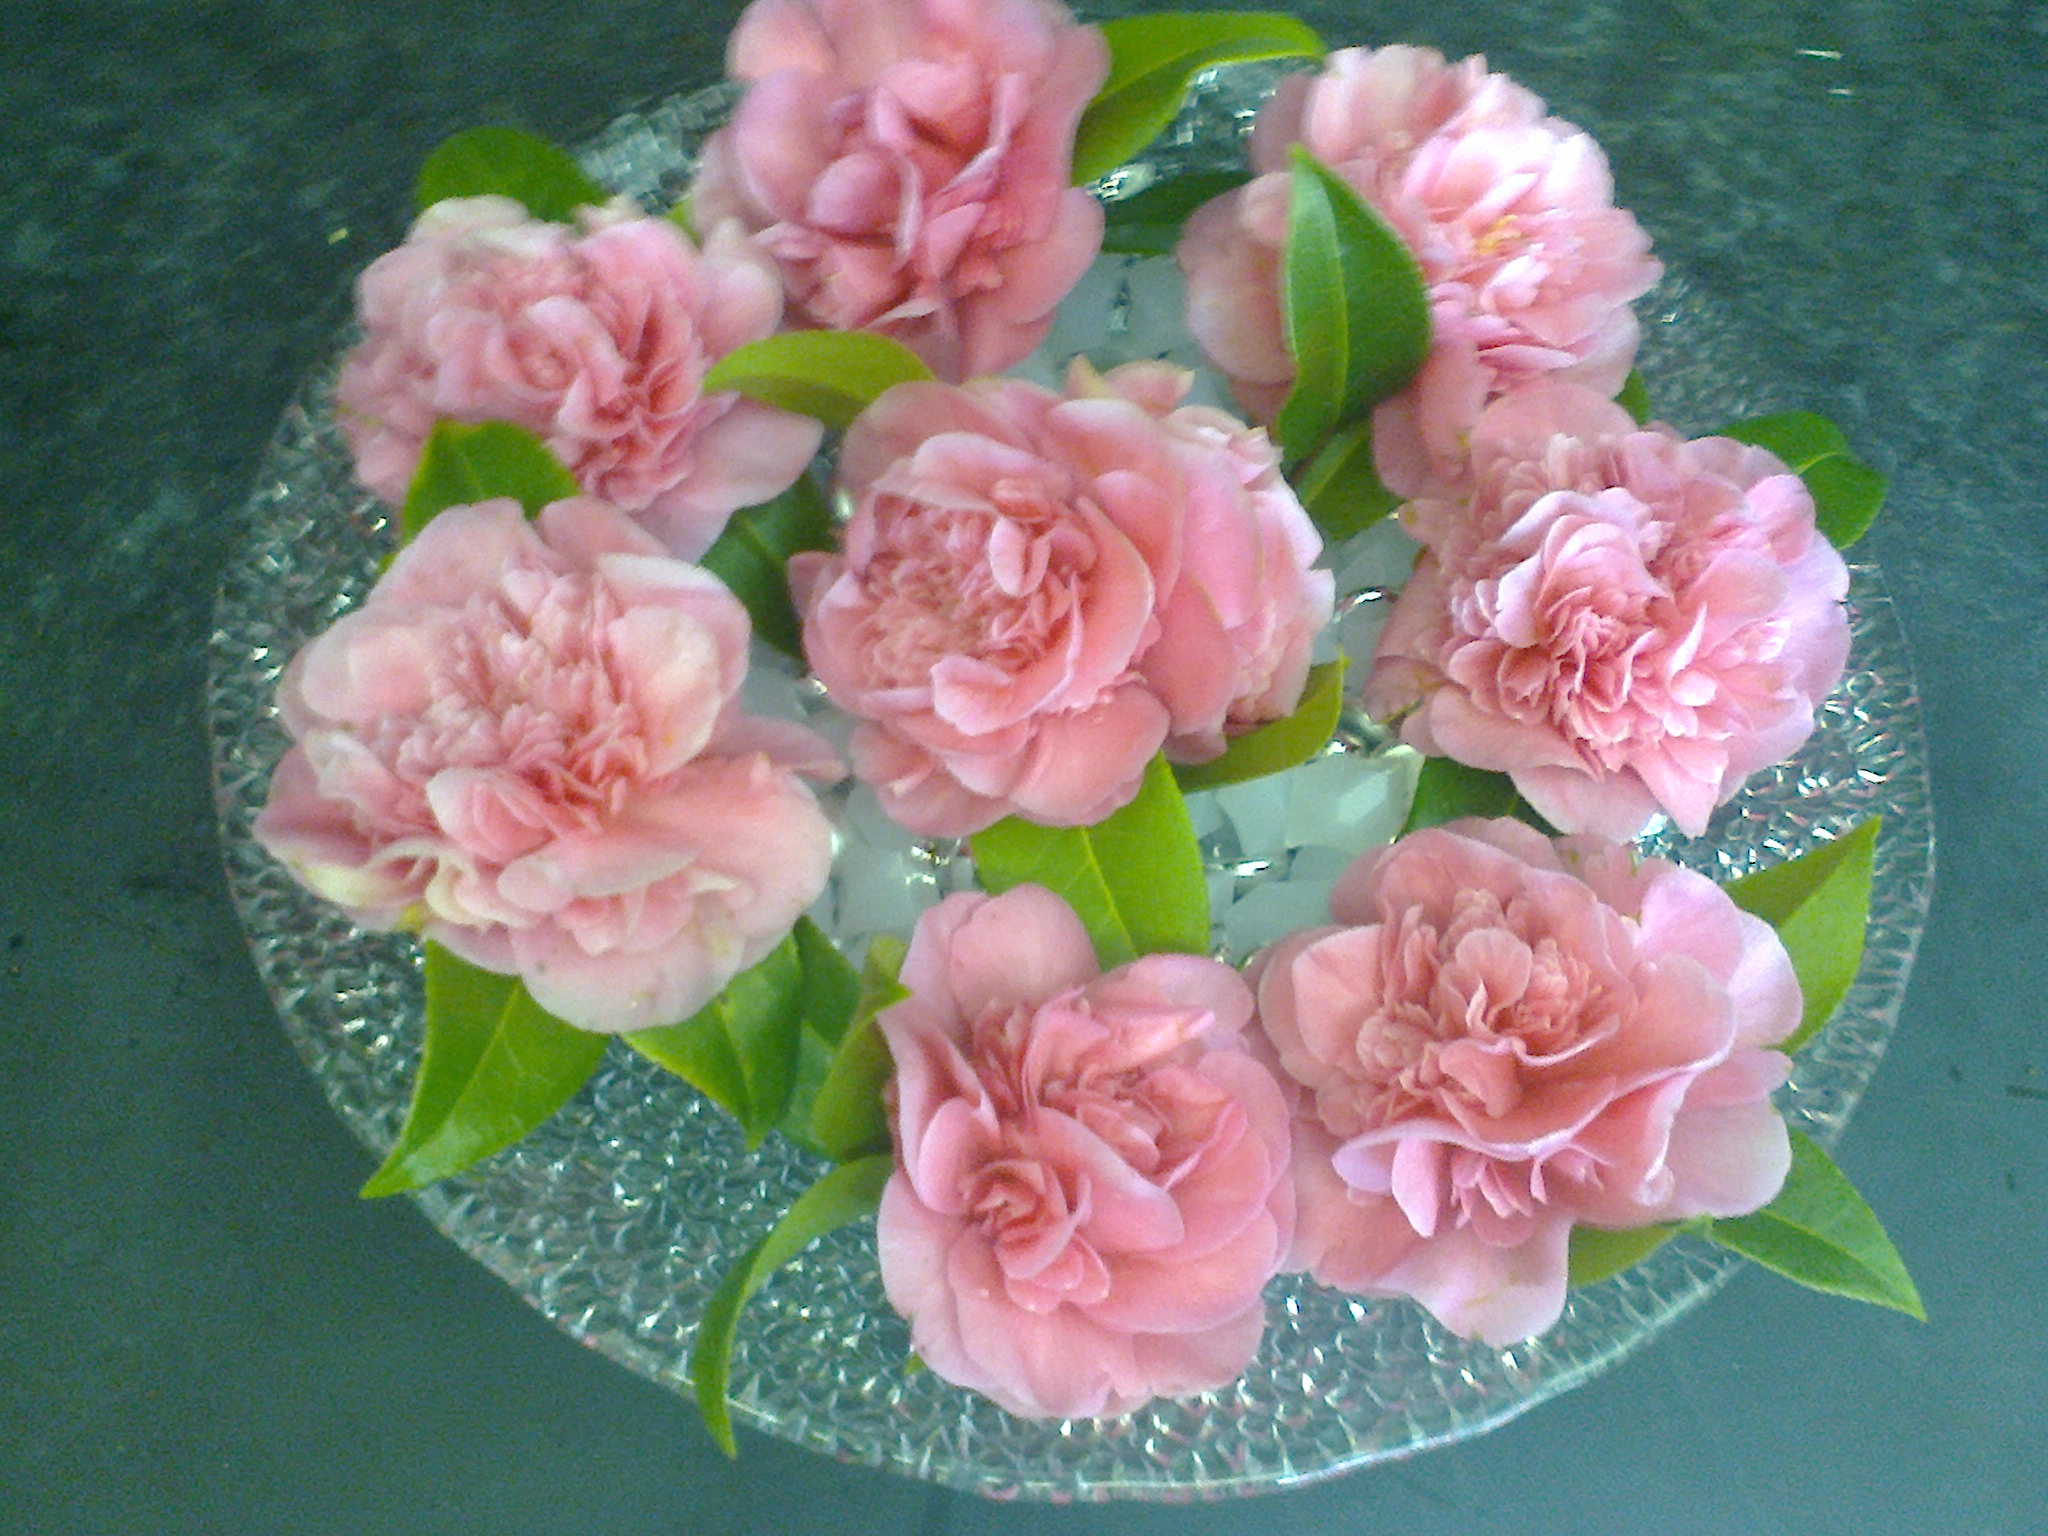 pink camelia blooms arranged in aqueous gel